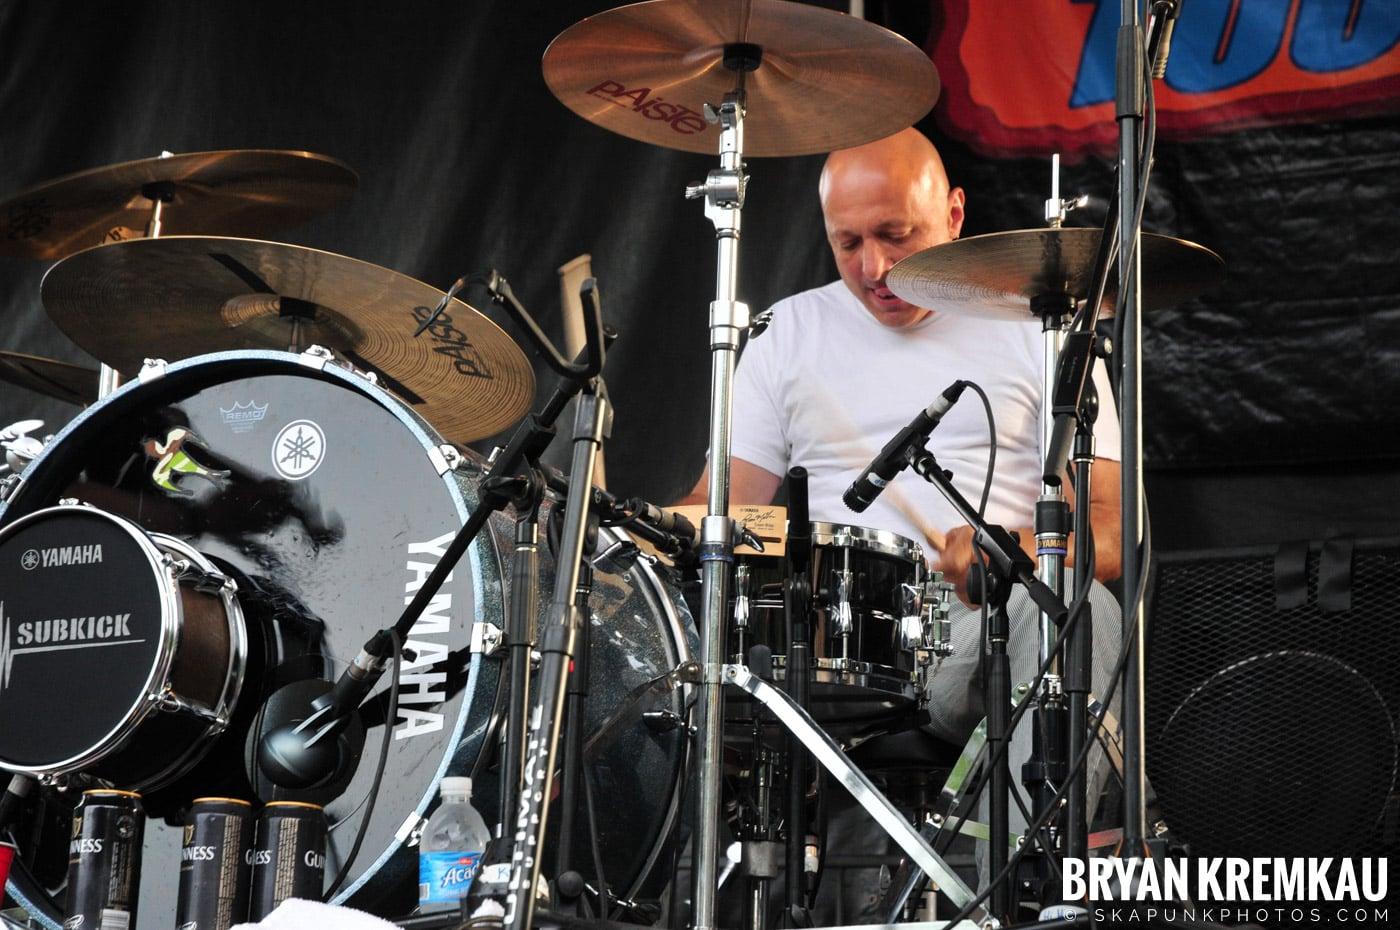 Flogging Molly @ Warped Tour 2009, Scranton PA - 07.15.09 (13)